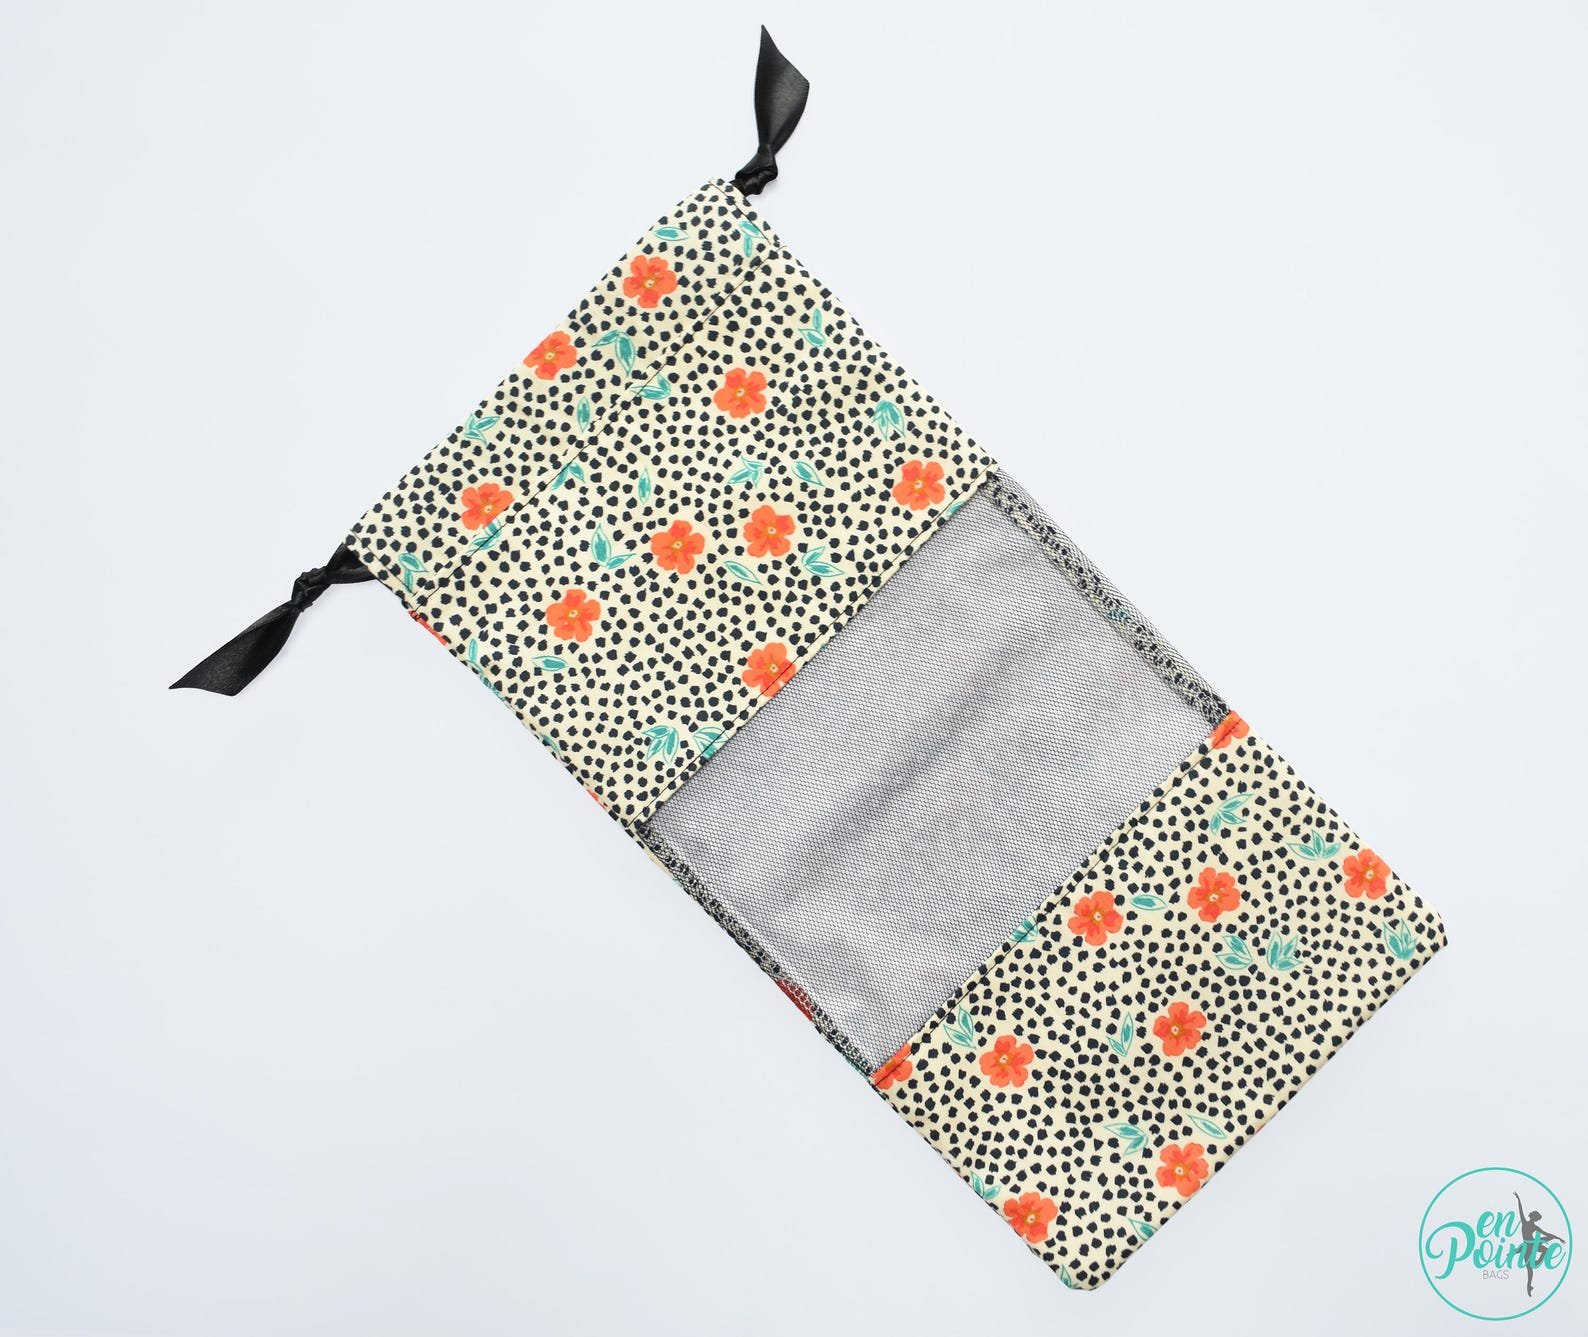 poppy | ballet pointe shoe bag - dance shoe bag - ballet bag